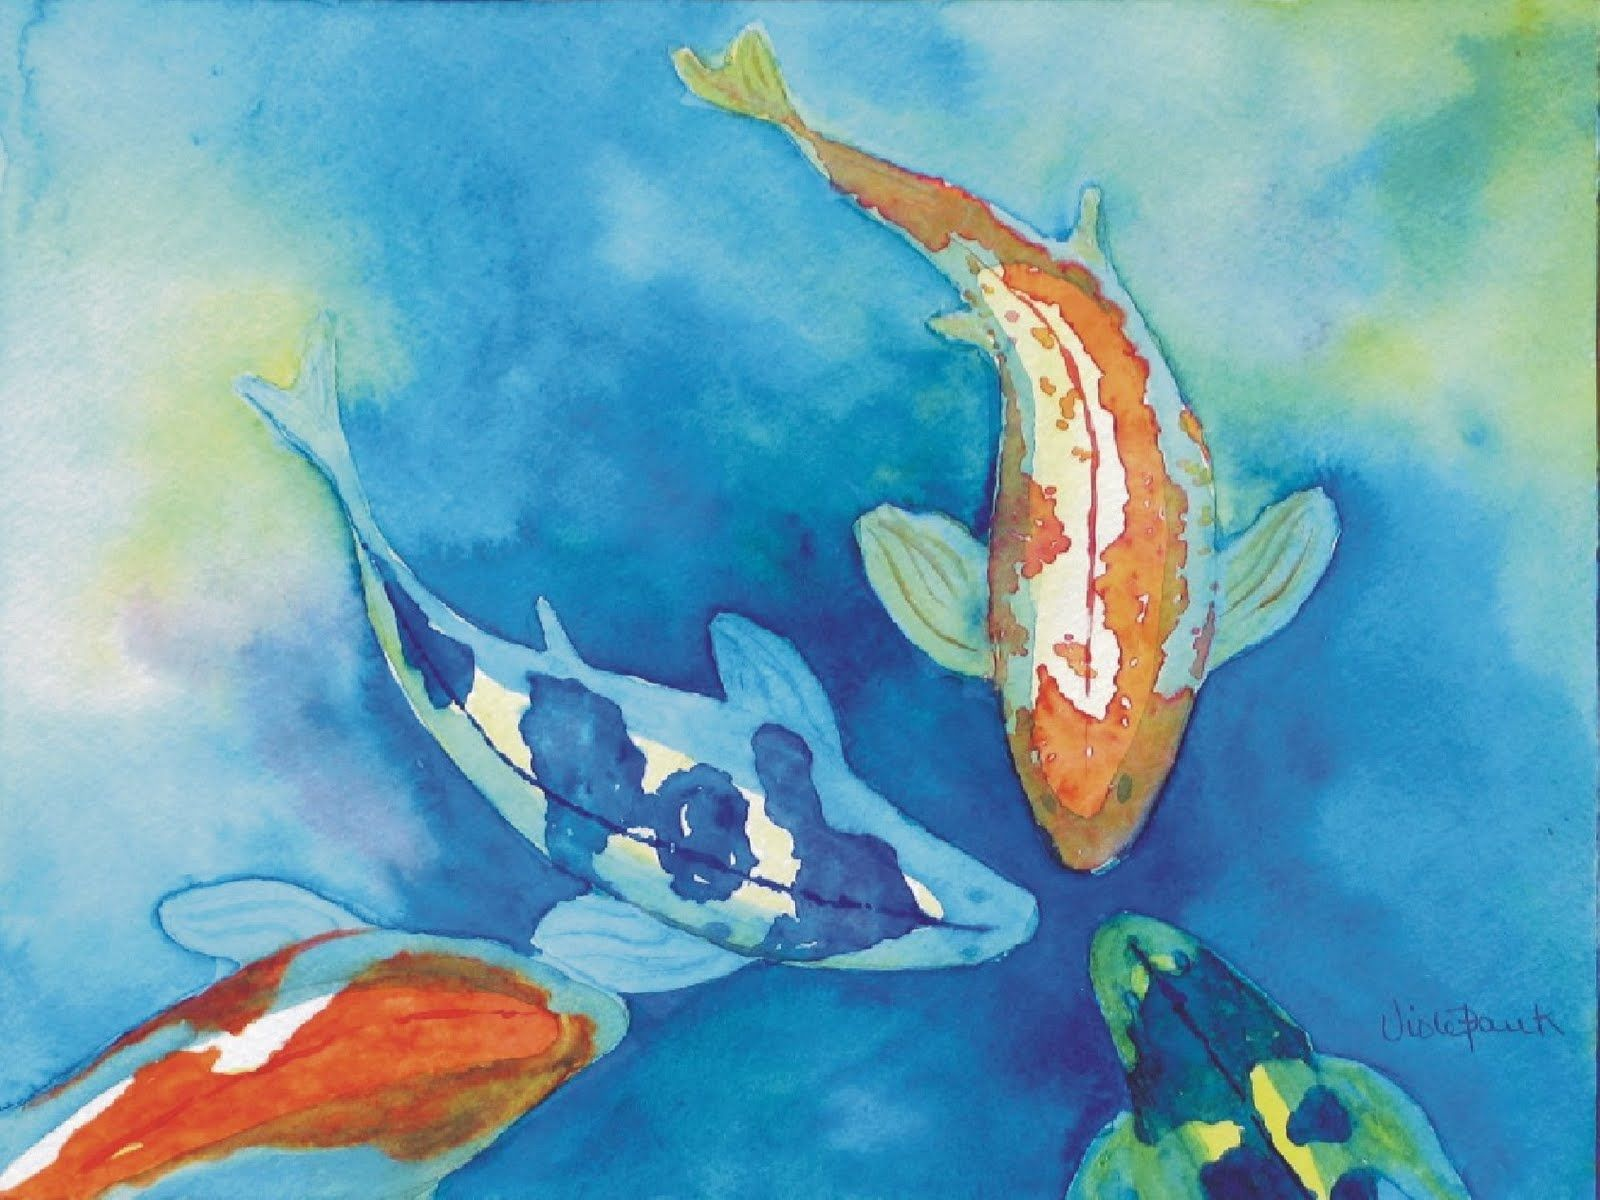 Koi fish painting watercolor images for Watercolor fish painting